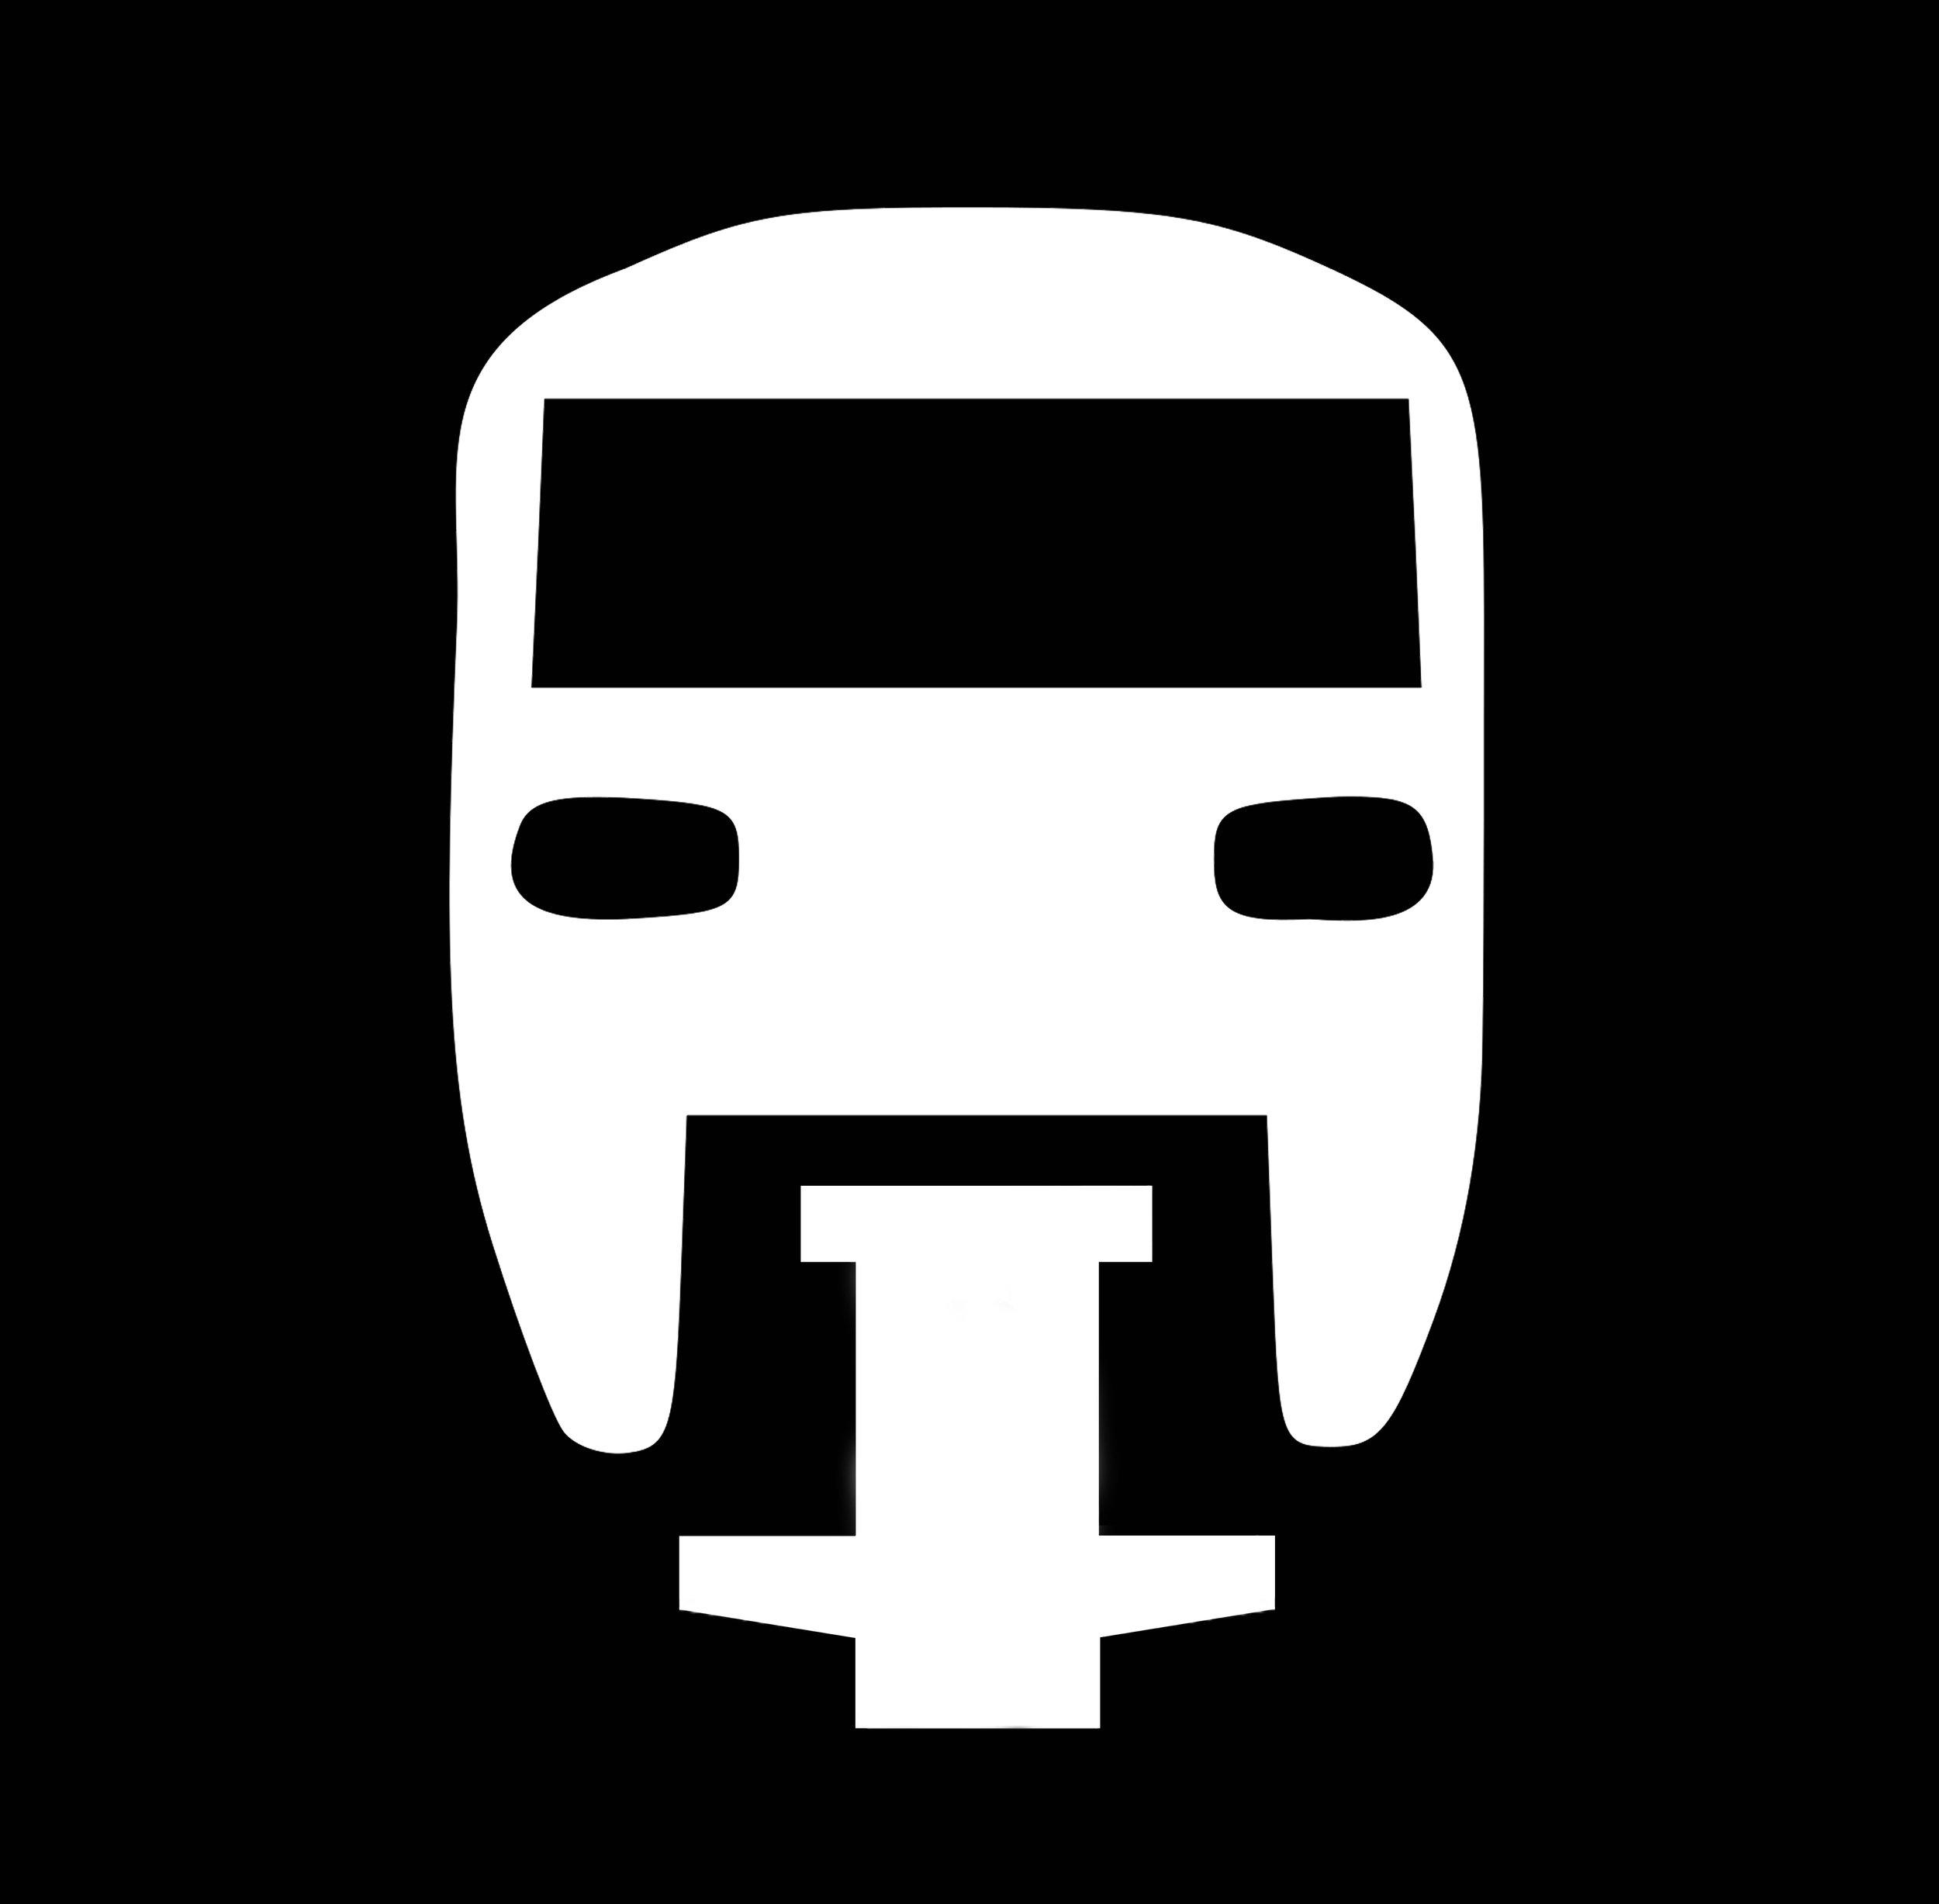 logo HyRail - a.jpg